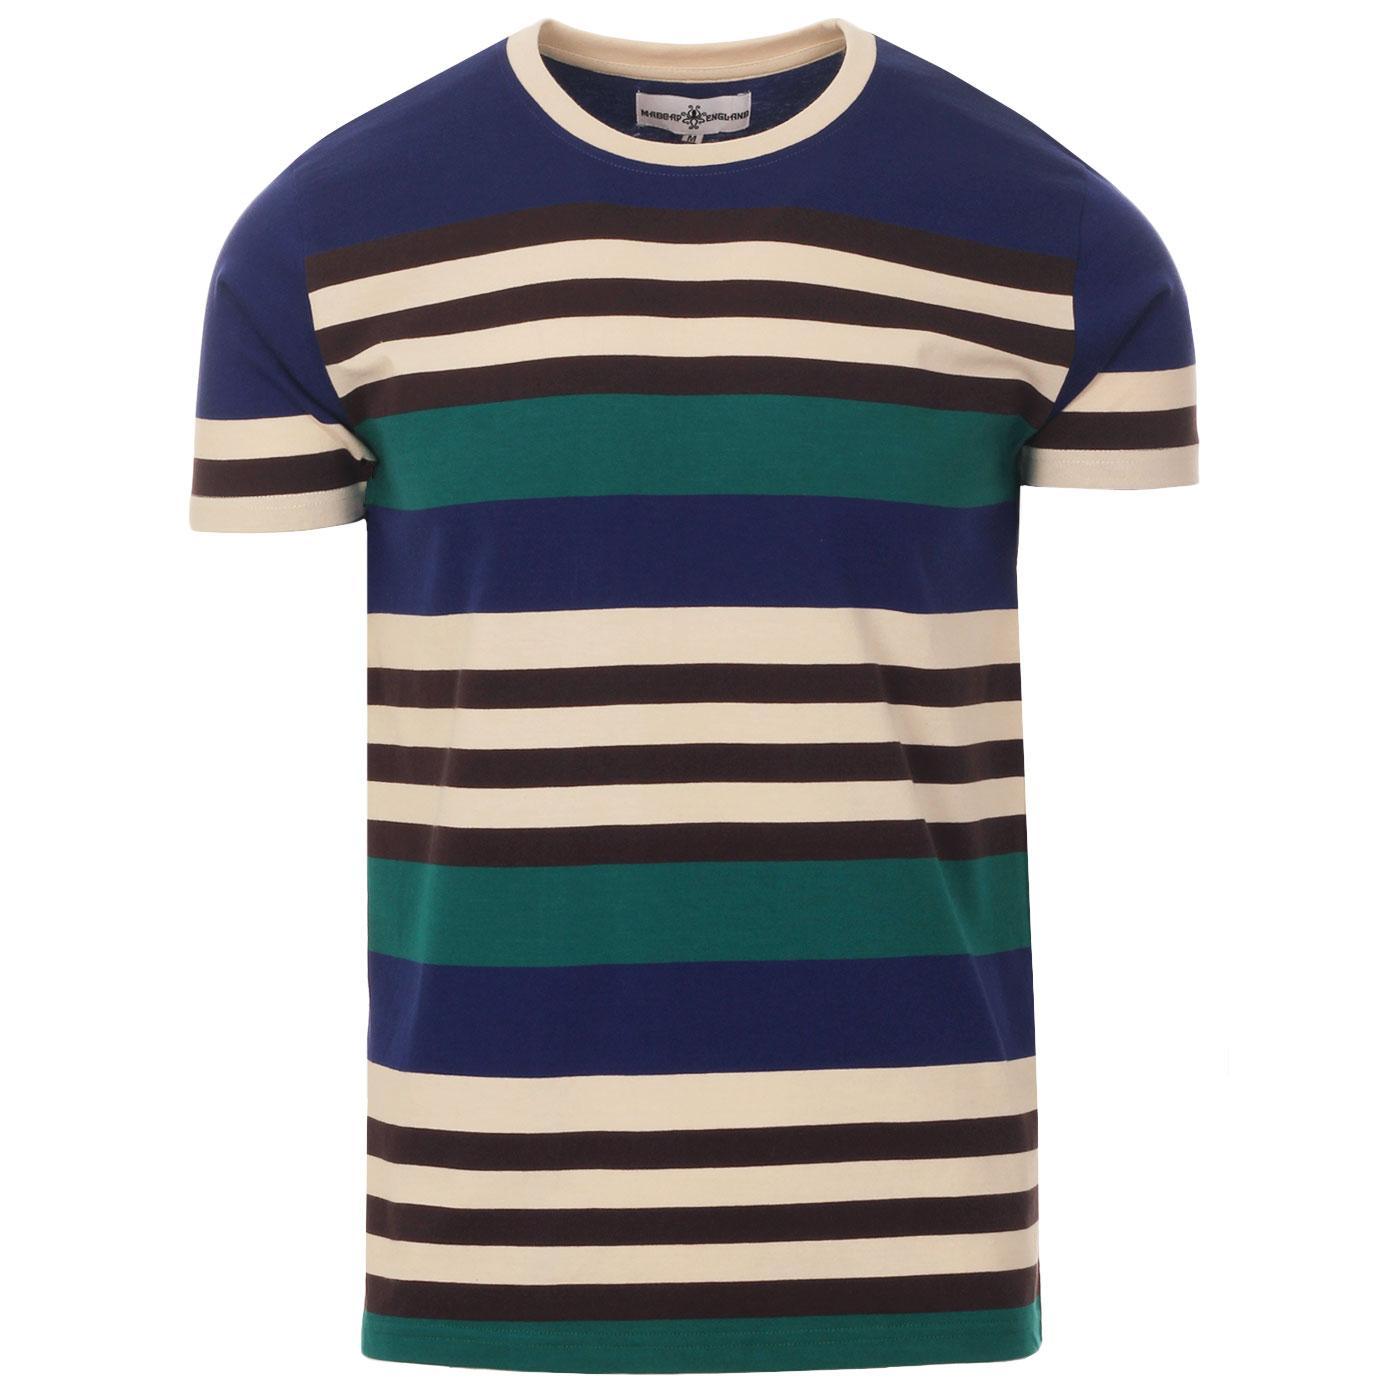 Madcap England Cosmo Retro 70s Stripe T-shirt in Beacon Blue